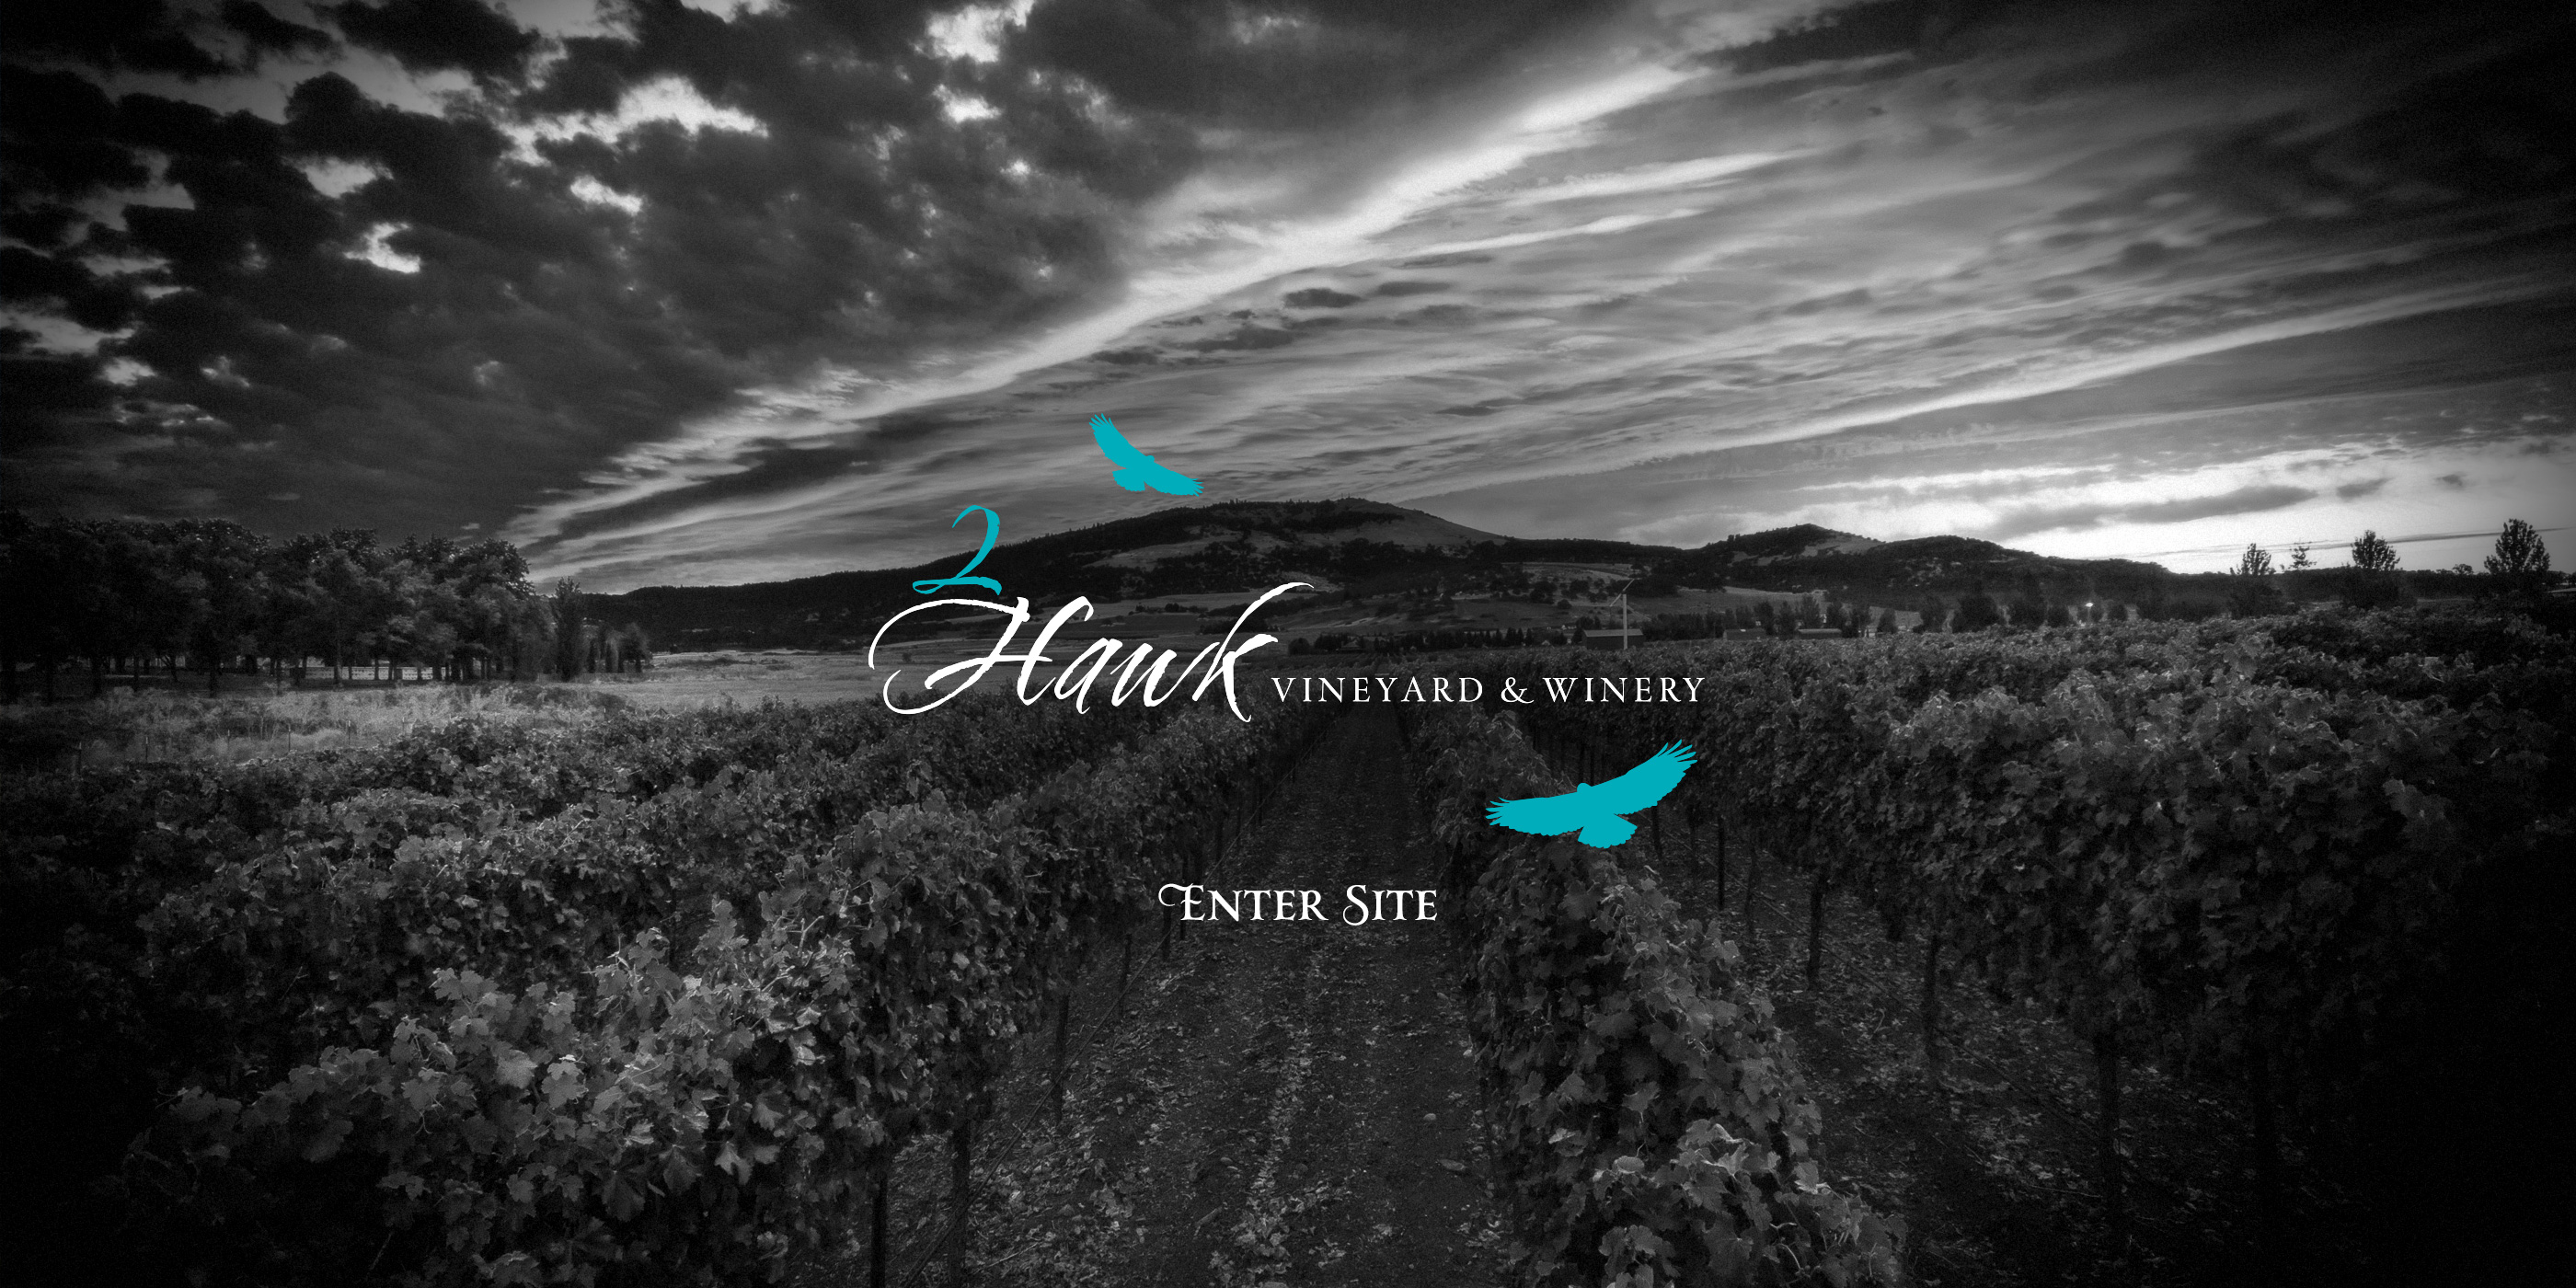 2Hawk Vineyard and Winery